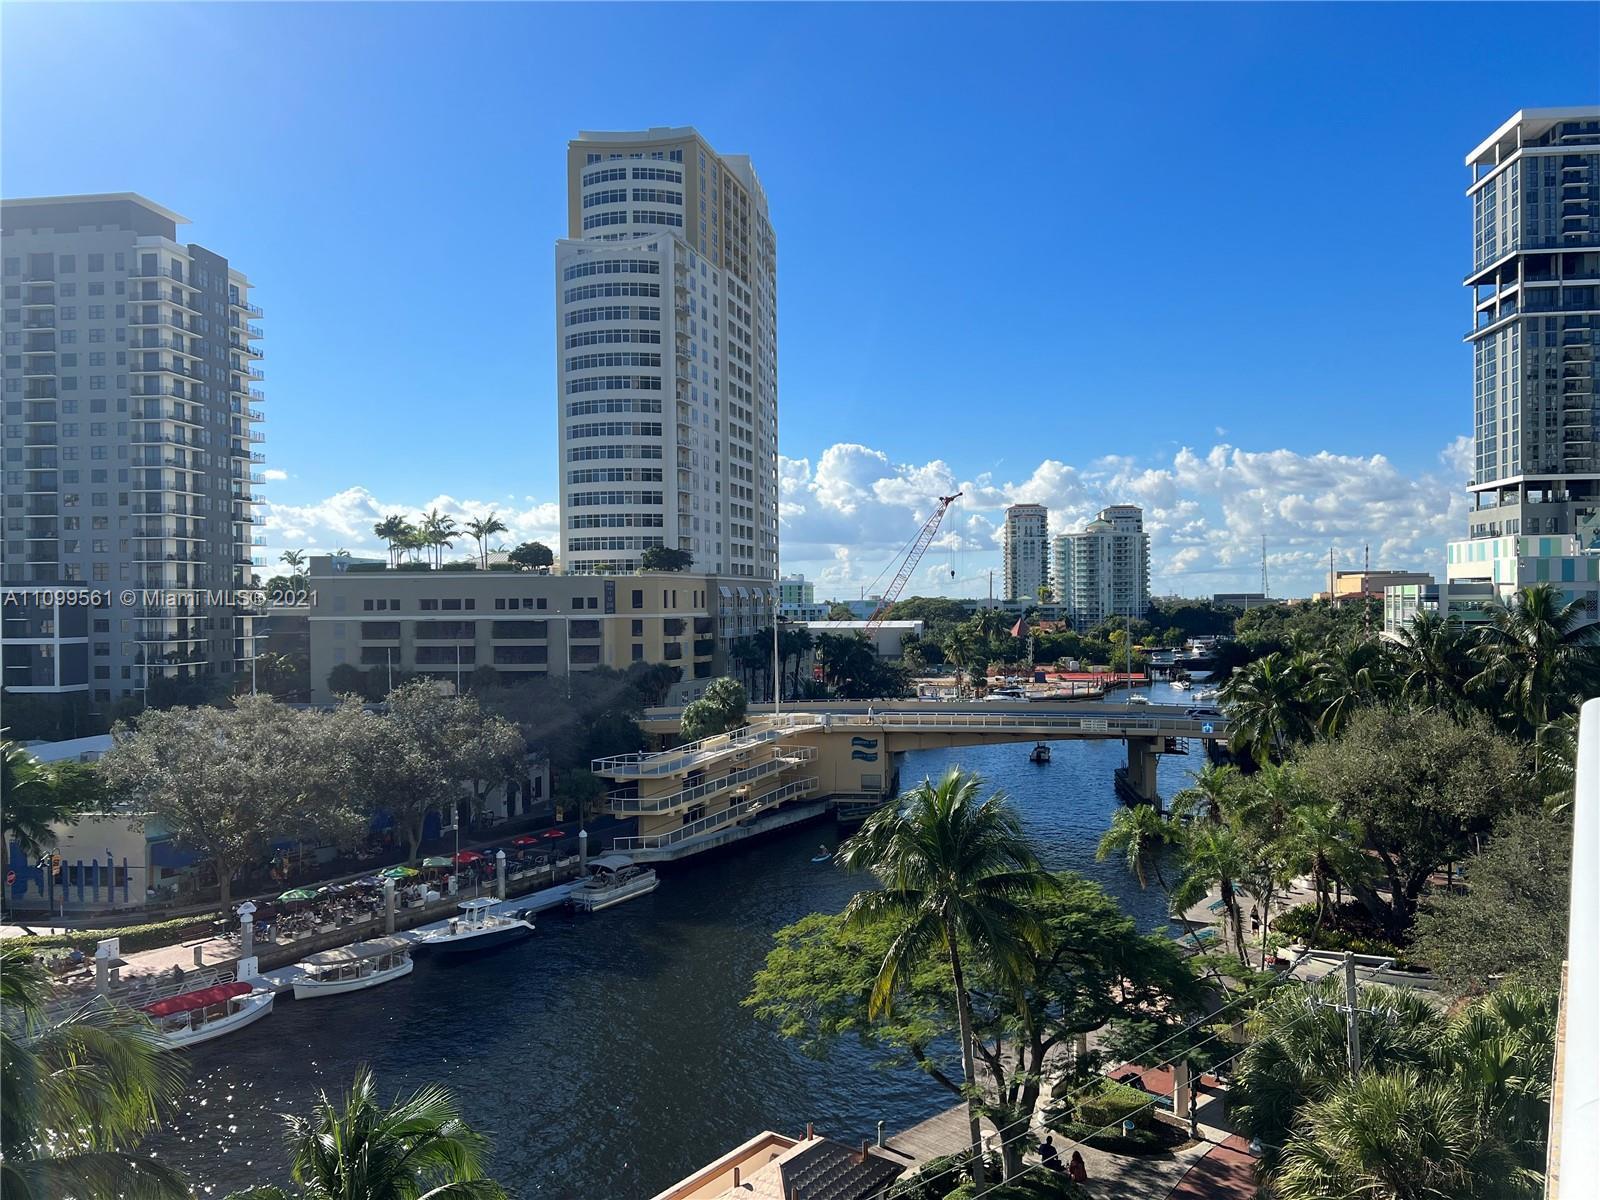 Las Olas River House #1207 - 333 LAS OLAS WY #1207, Fort Lauderdale, FL 33301